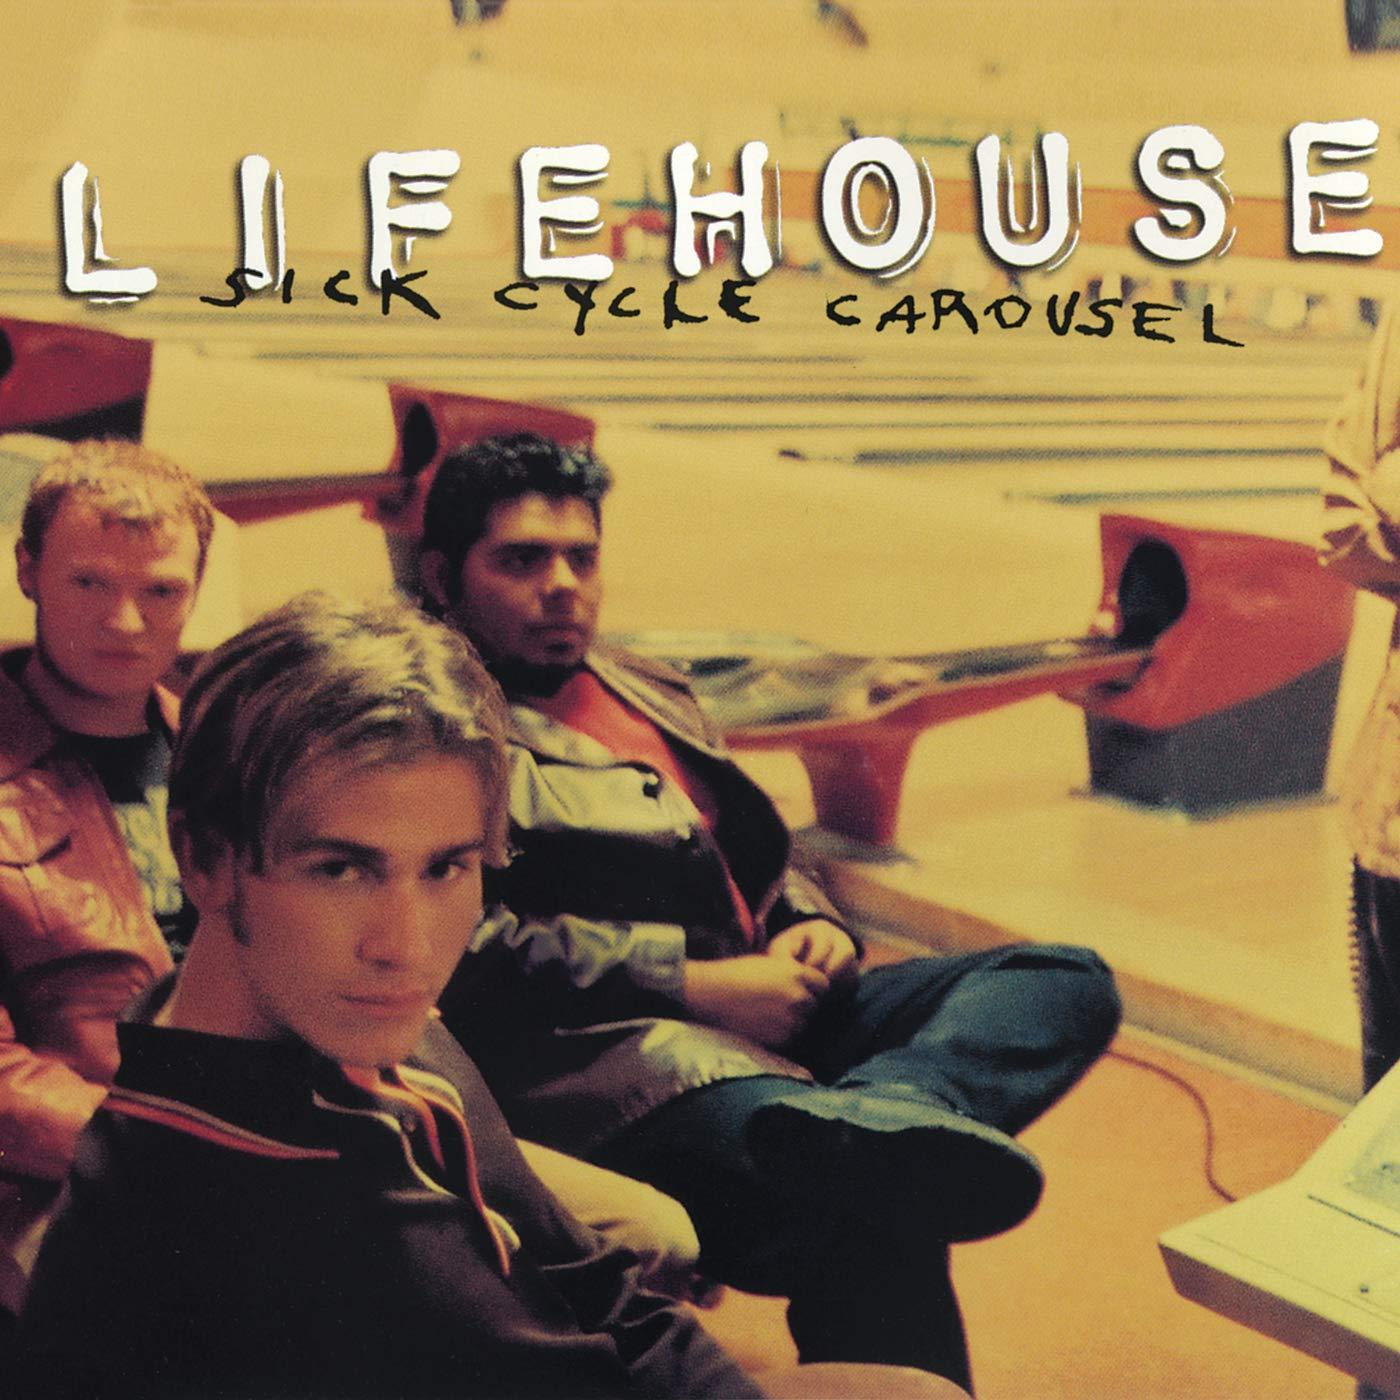 Lifehouse – Sick Cycle Carousel (2000) [FLAC]